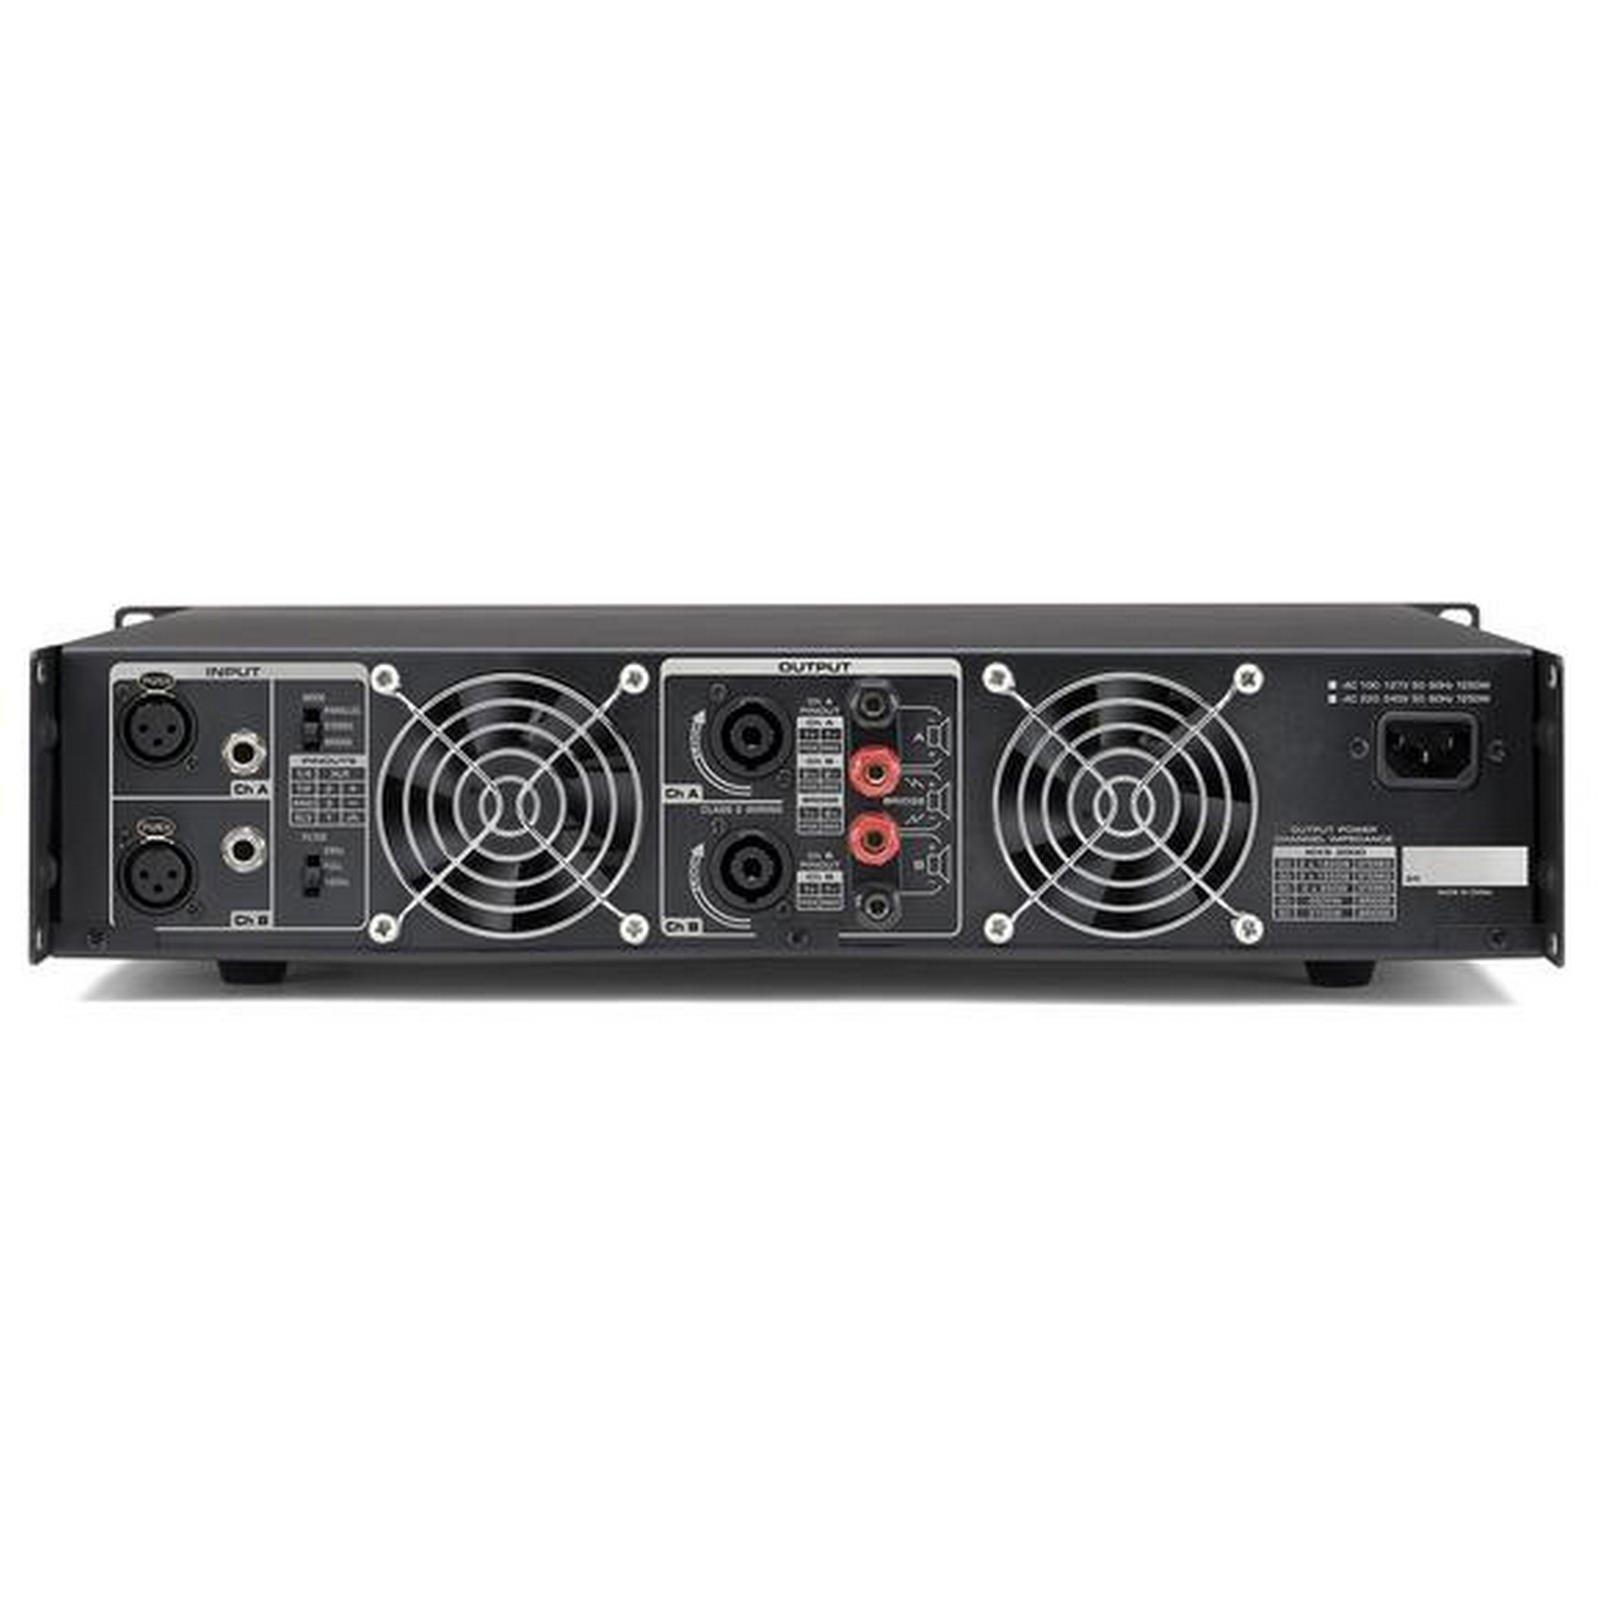 Samson MXS3000 | 3000 Watt Professional Power Amplifier by Samson (Image #2)